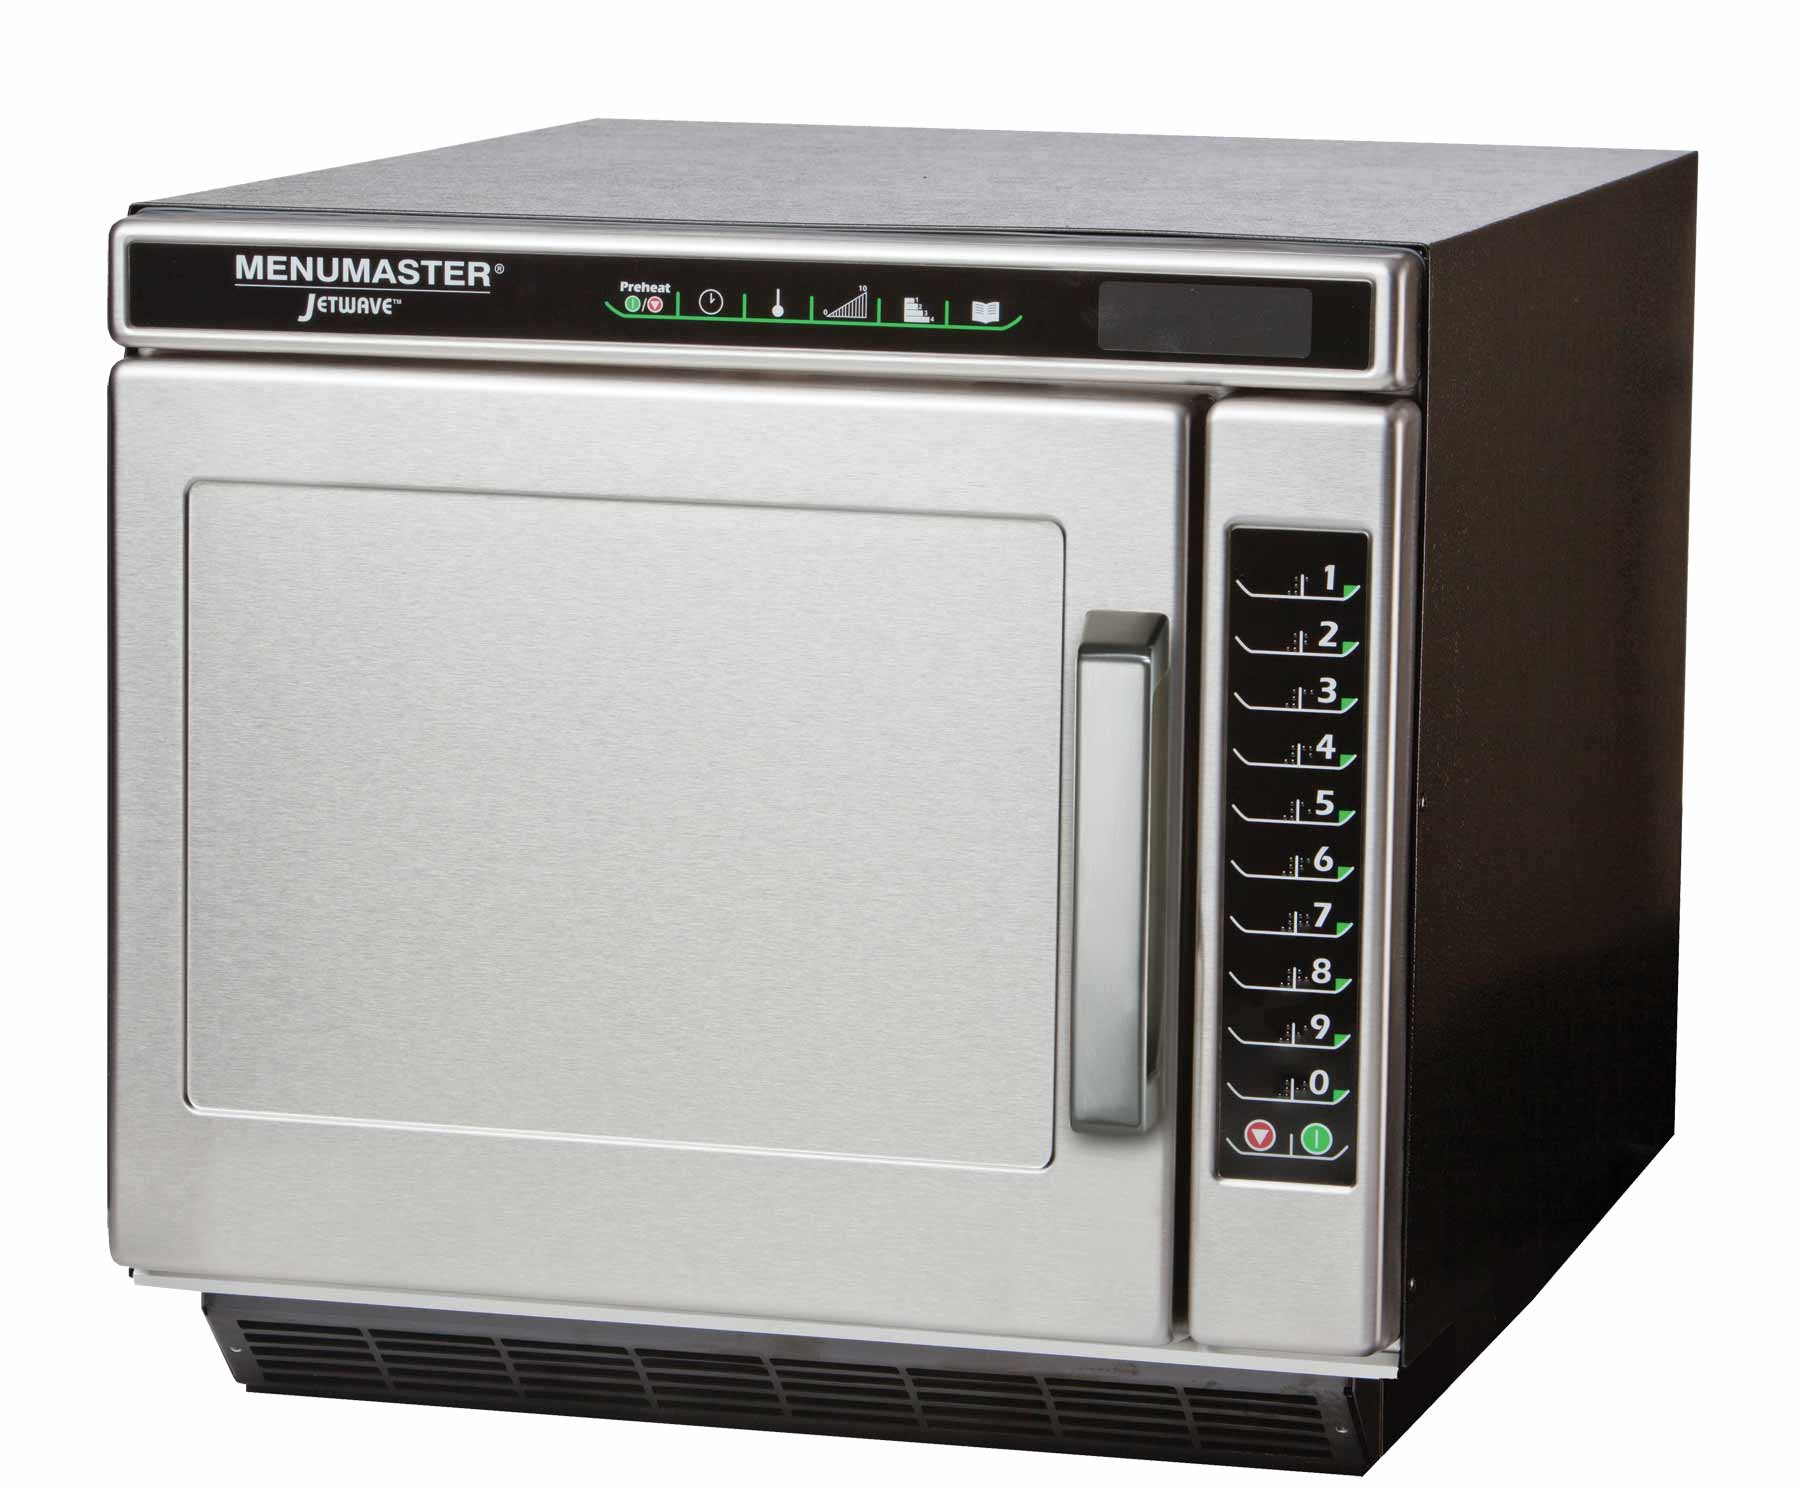 commercial microwave oven amana jetwave convection microwave oven rh dvorsons com Amana EvenAir Convection Self-Cleaning Oven Amana Convection Express Manual